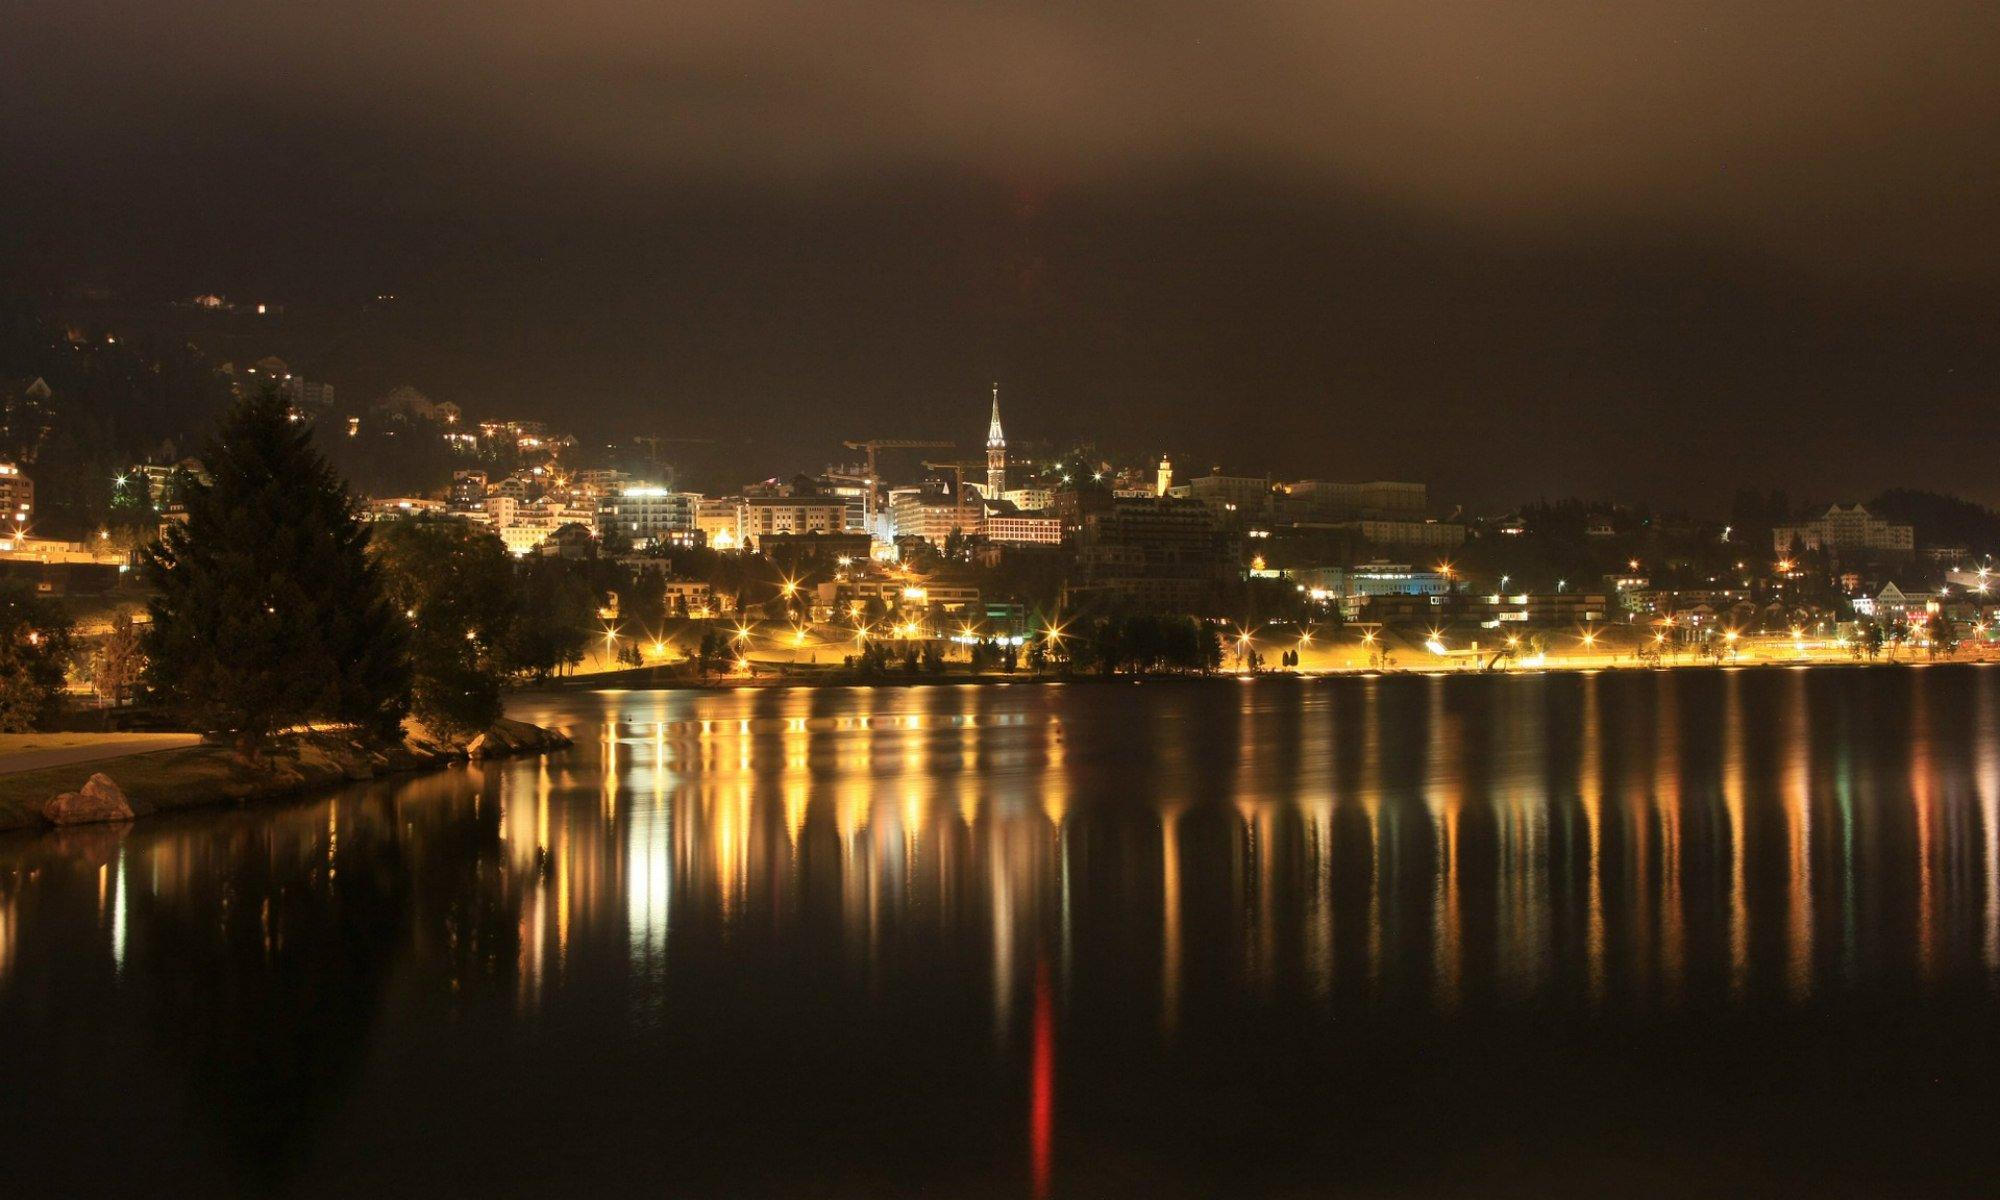 St. Moritz bei Nacht.